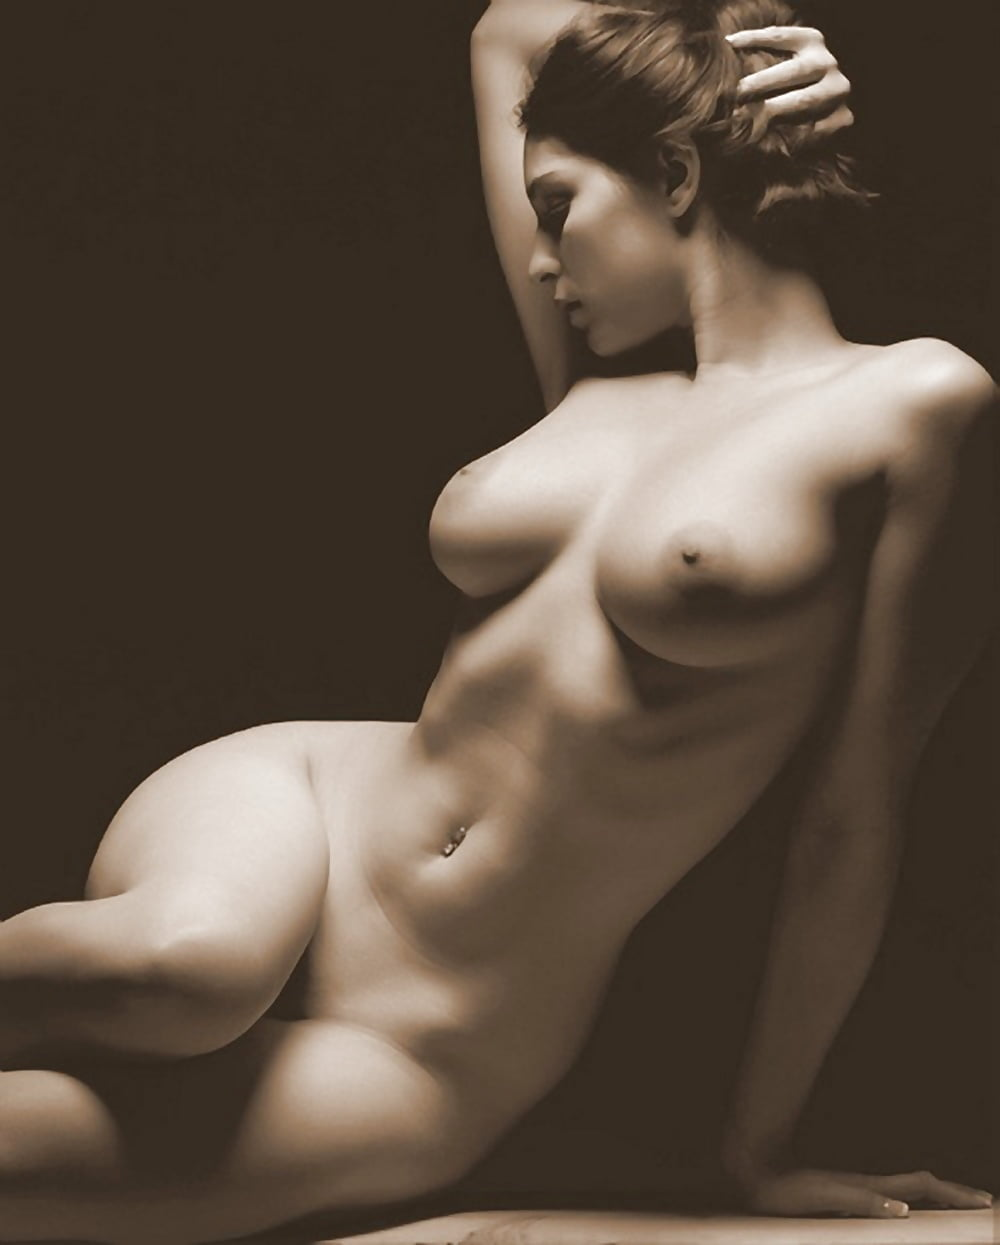 krasivie-eroticheskie-foto-klassika